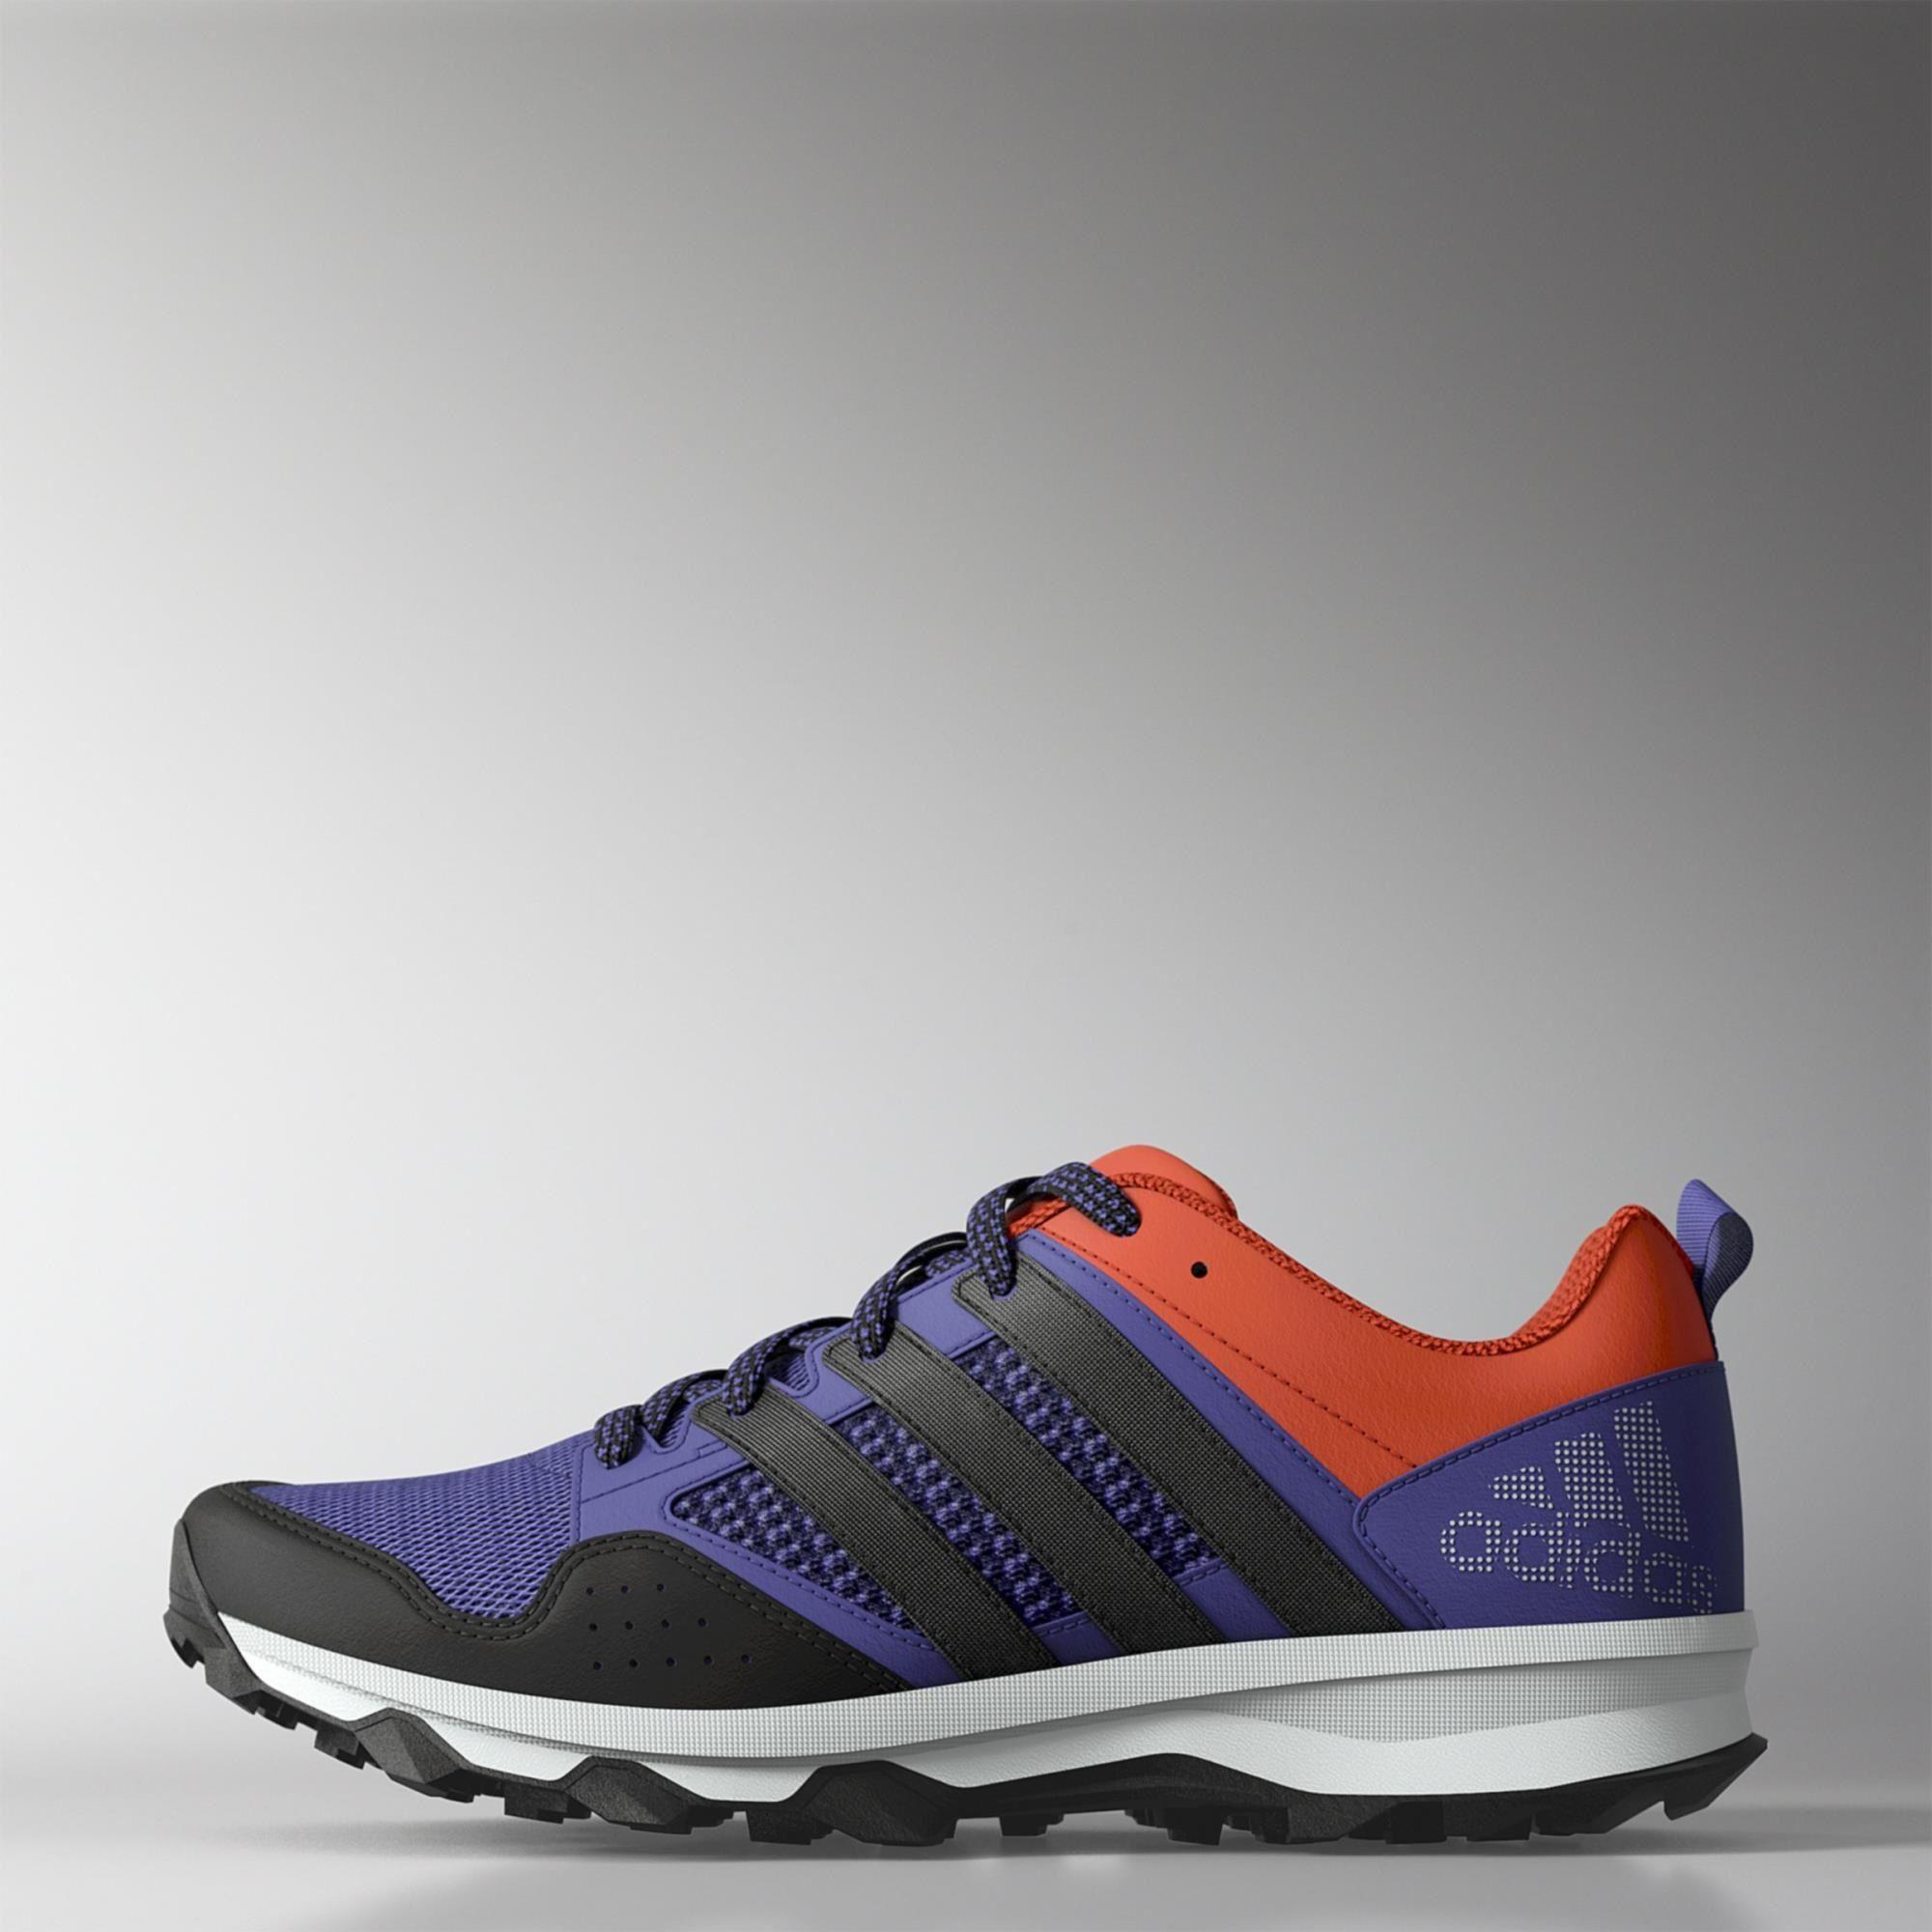 the best attitude 9aa2b ce044 Adidas Kids Kanadia 7 Trail Running Shoes - Night Flash/Black